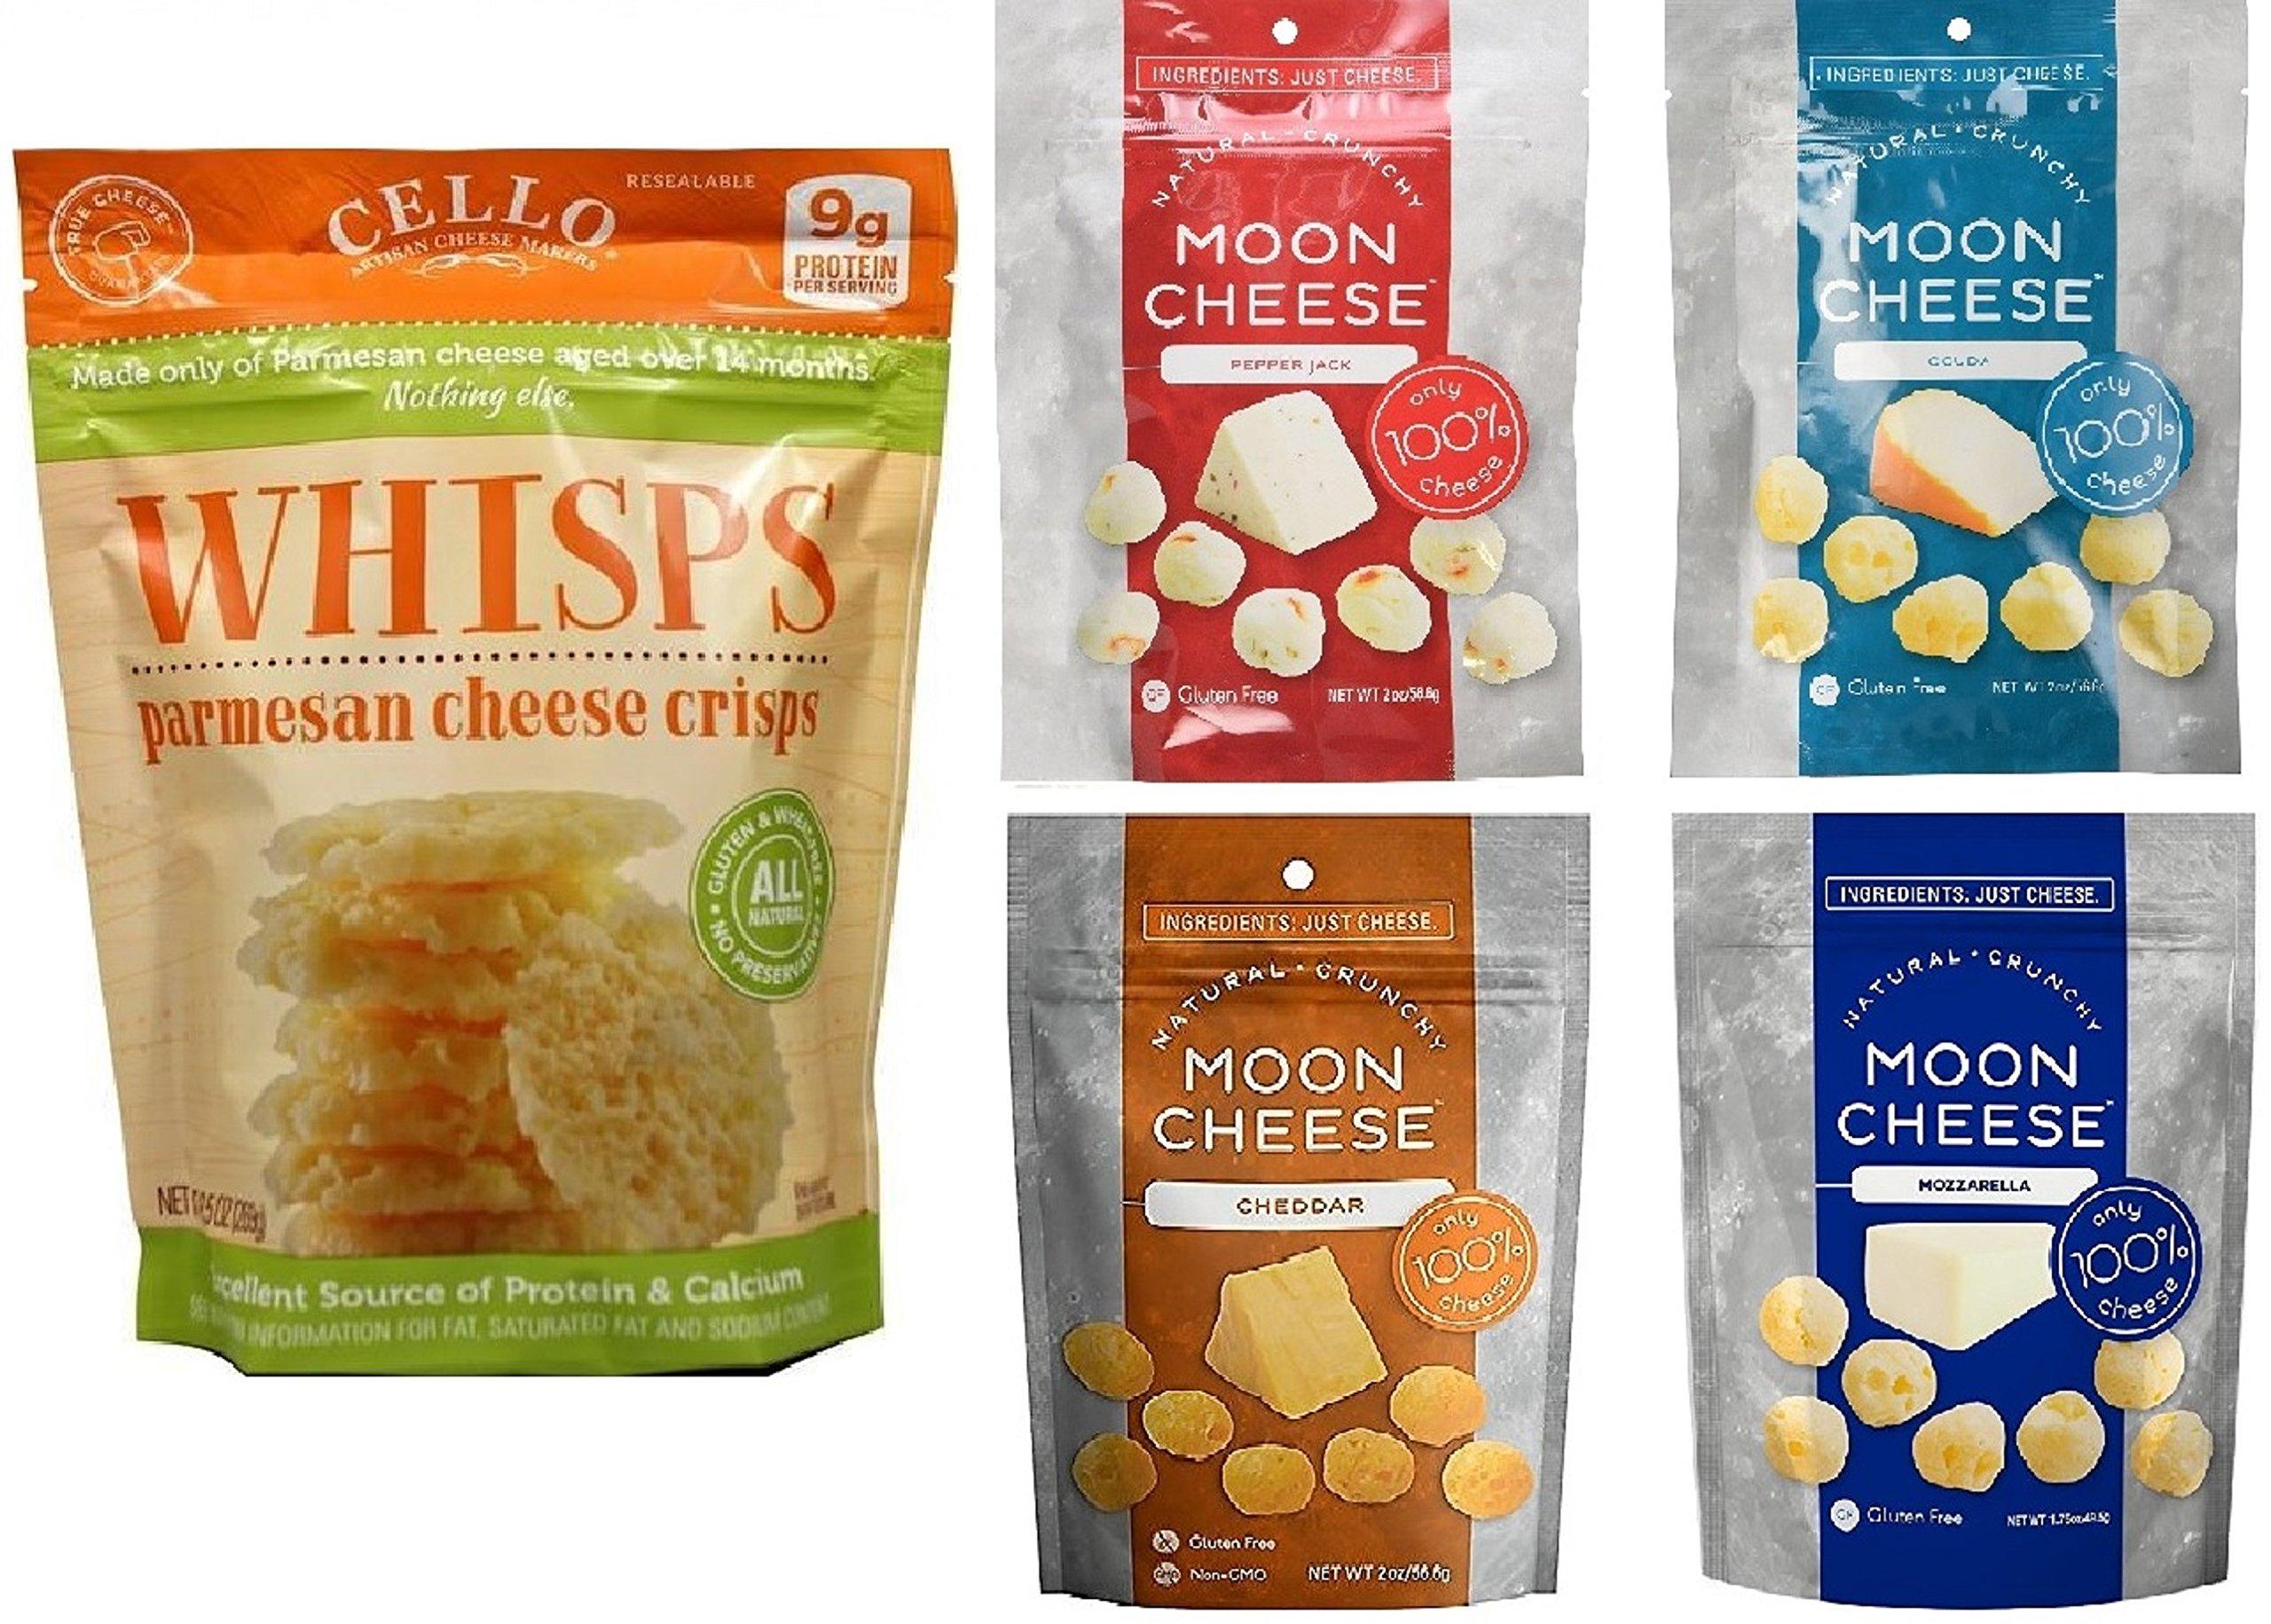 Whisps Parmesan (9.5 oz) & Moon Cheese Cheddar, Gouda, Pepperjack and Mozzarella (2 oz)